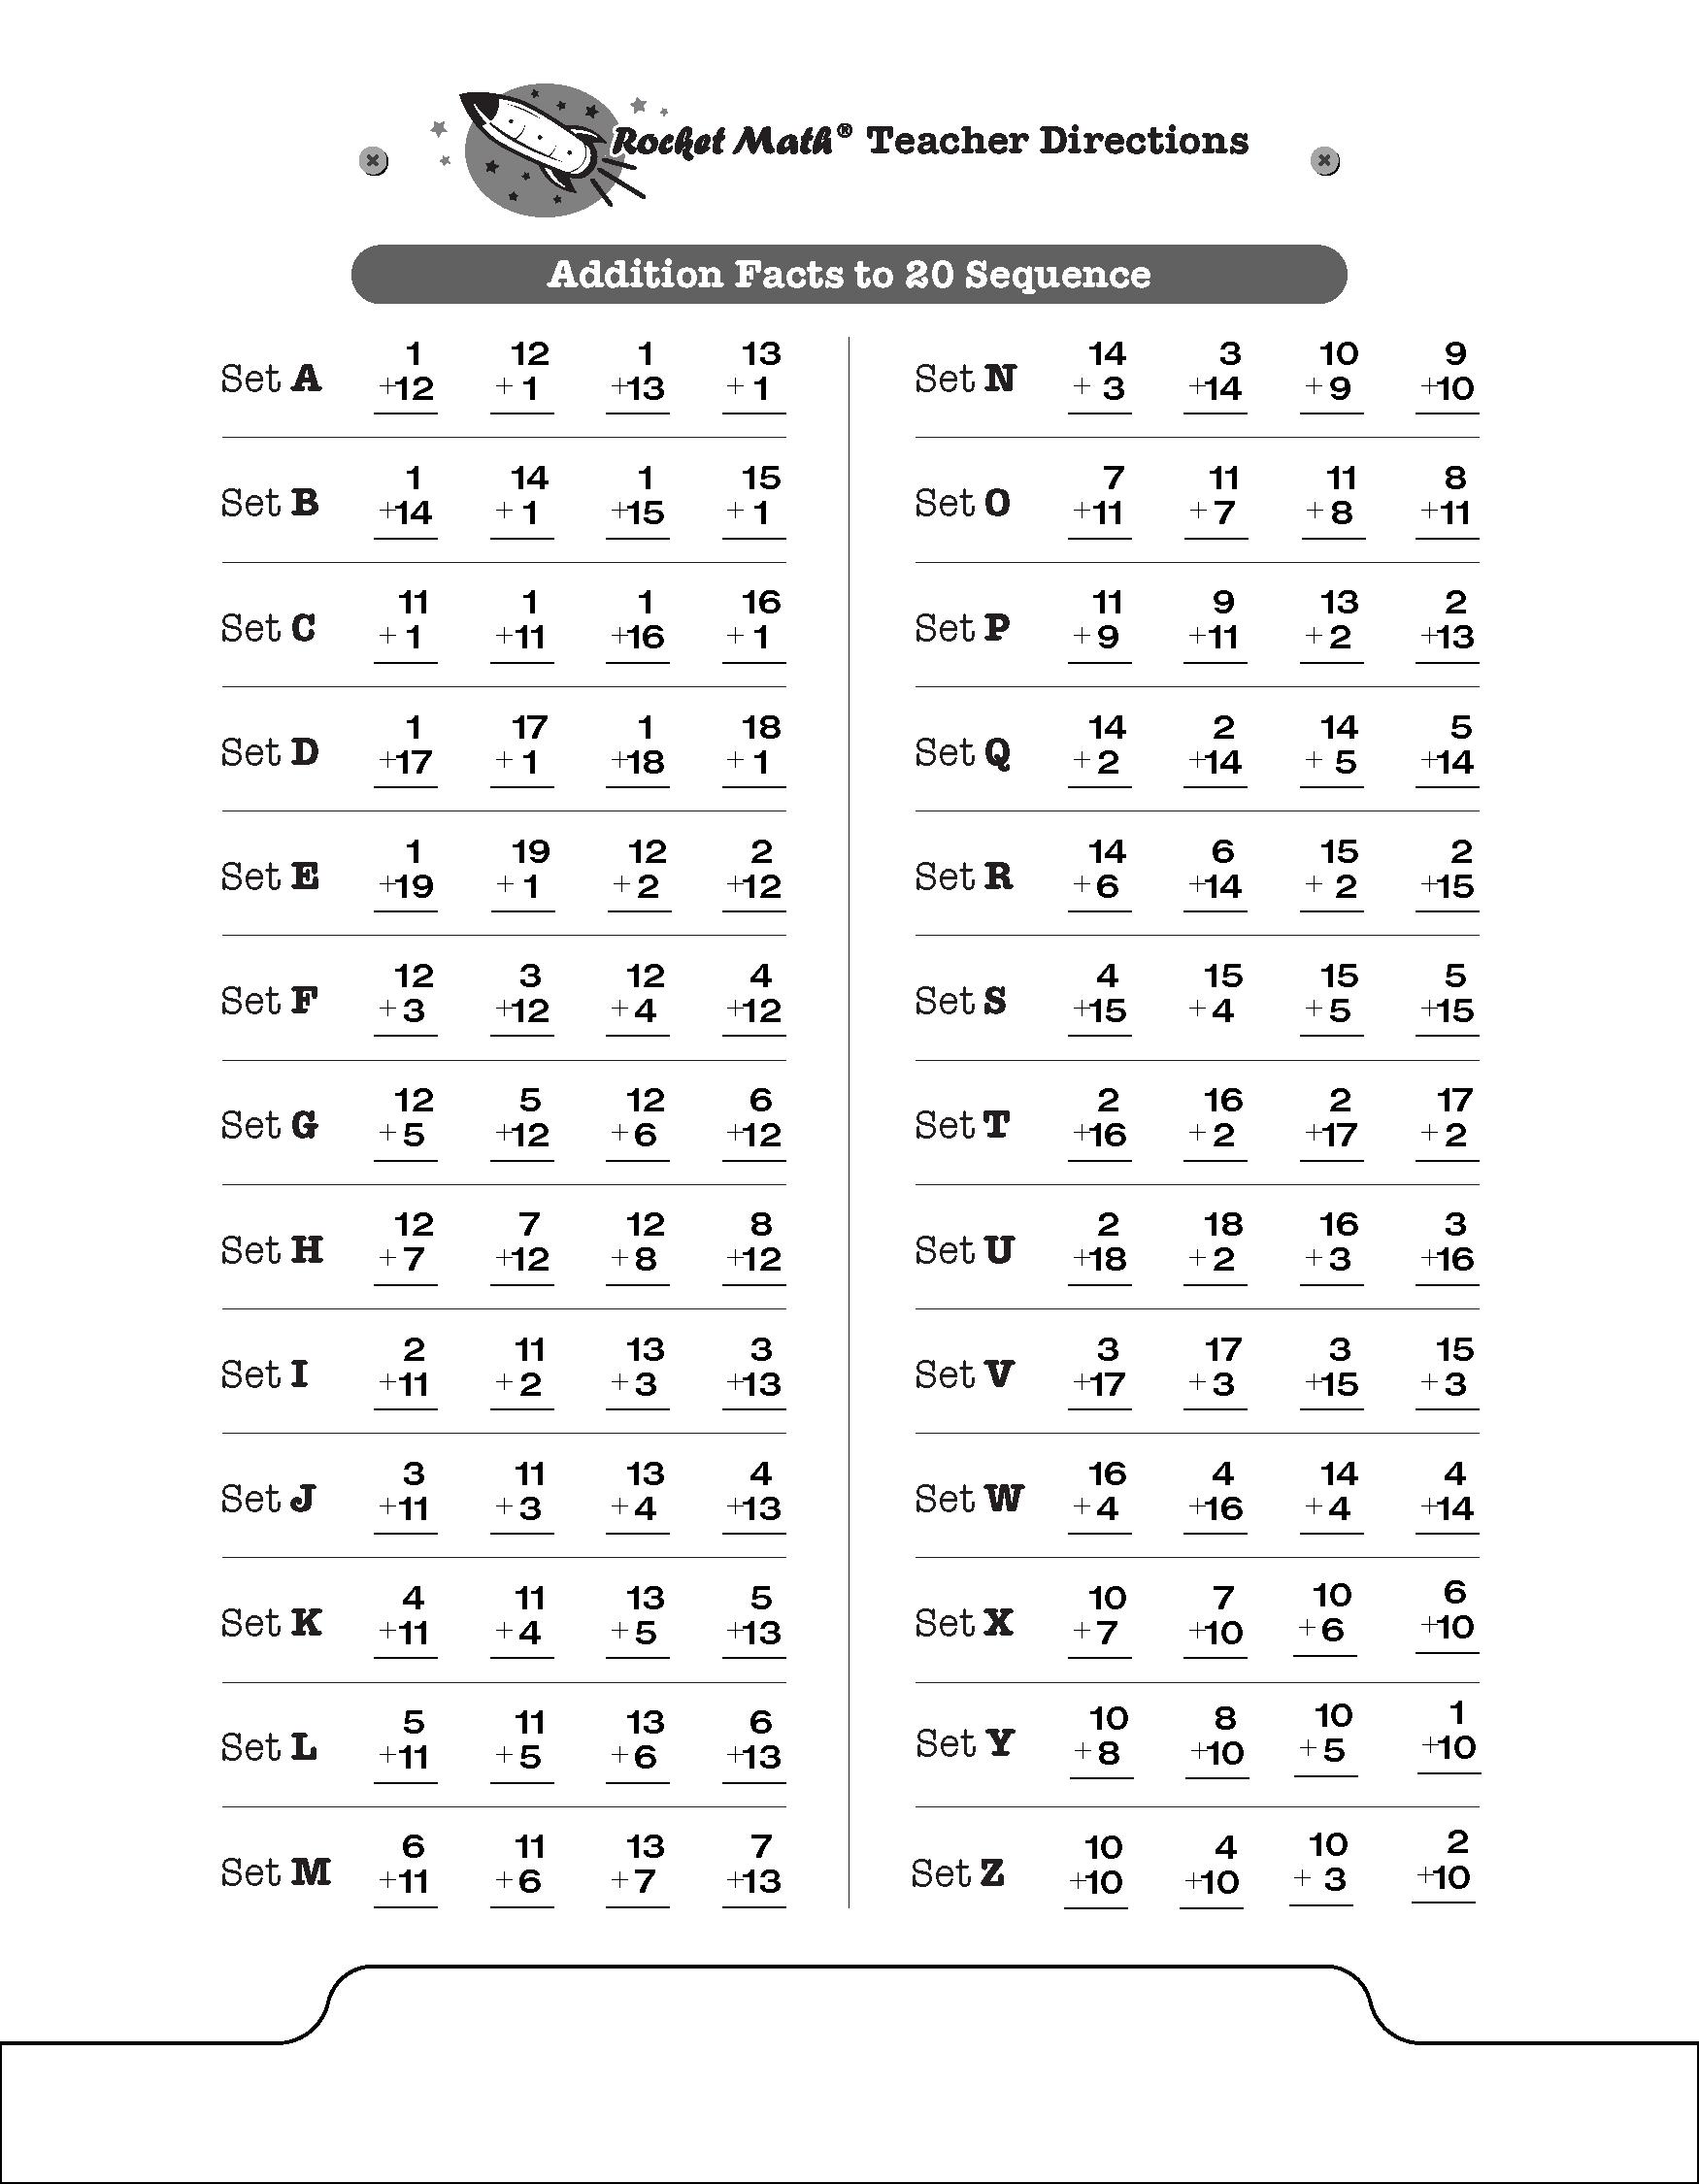 Adddition Rocket Math